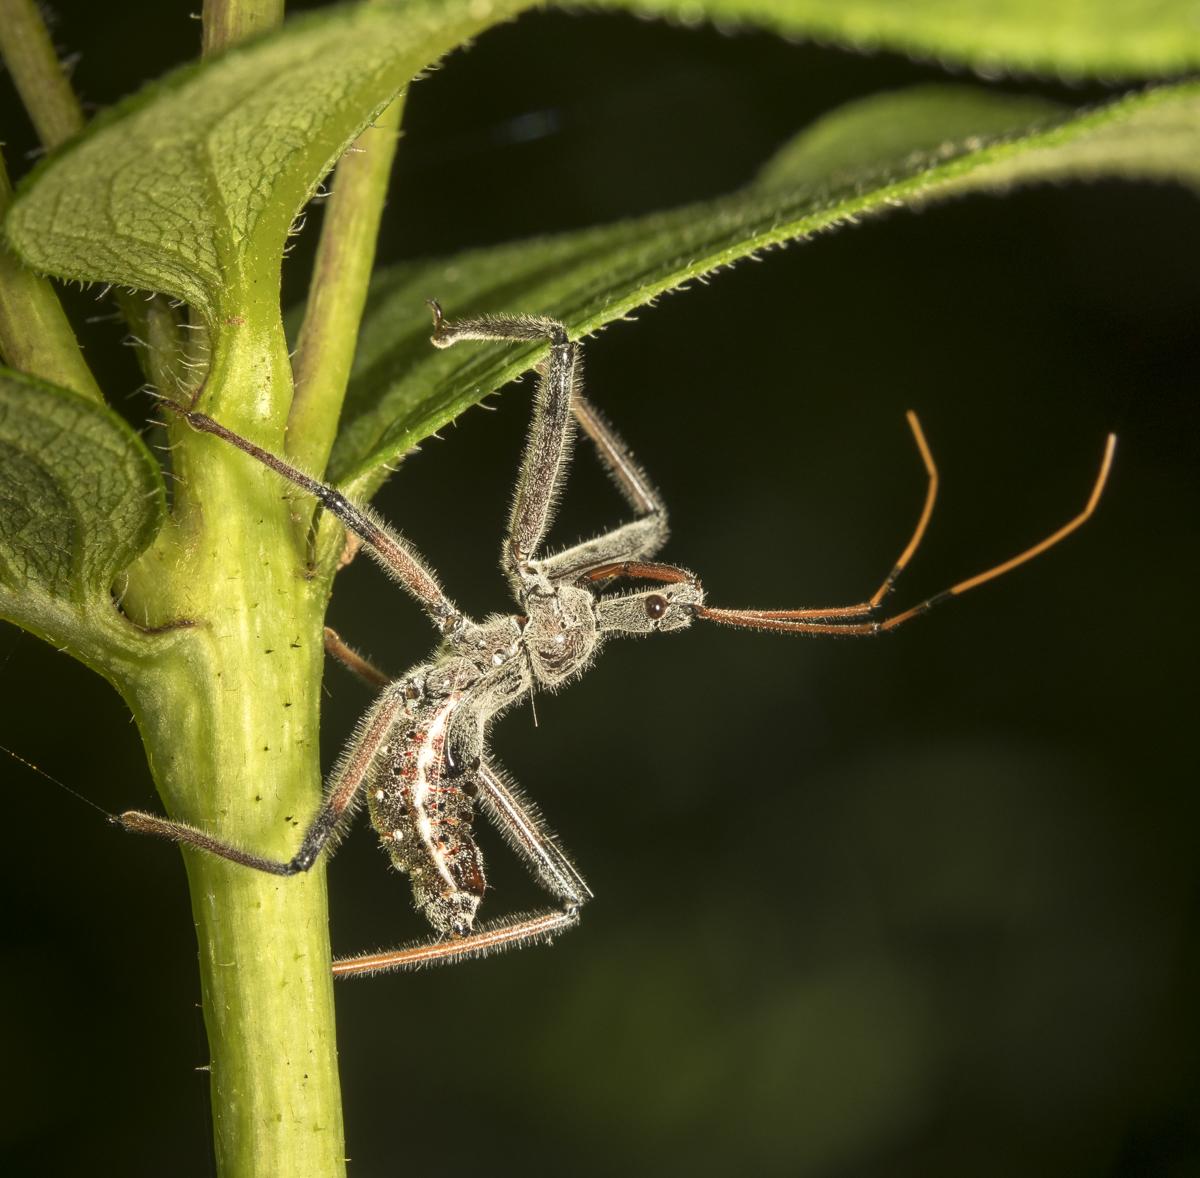 Wheelbug nymoh